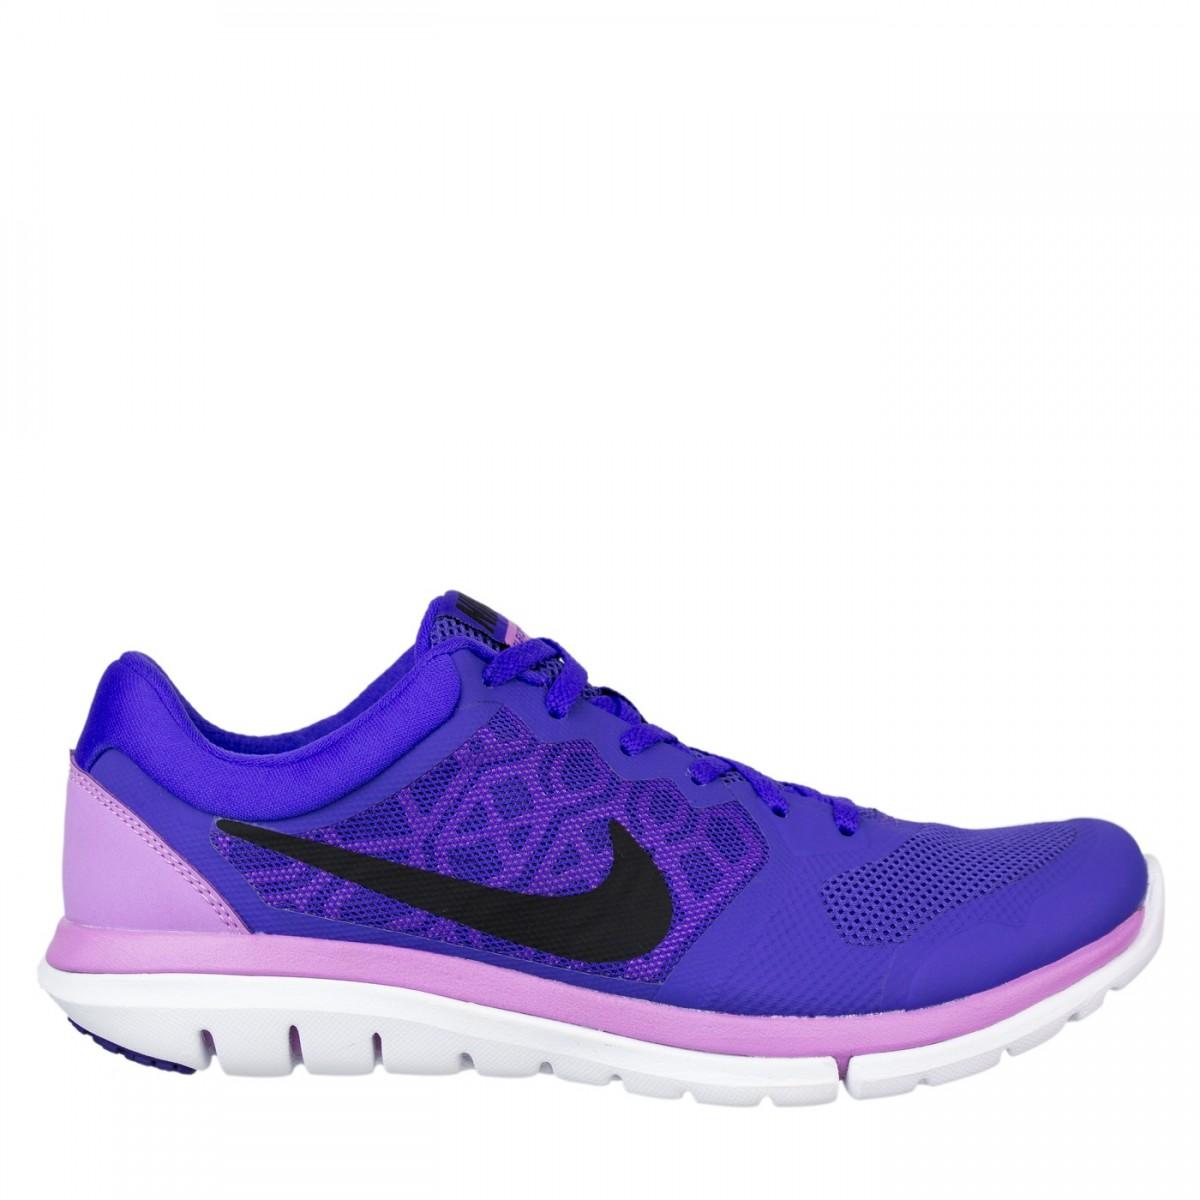 9c6c34df8fc Bizz Store - Tênis Feminino Nike Flex Para Corrida 724987-004